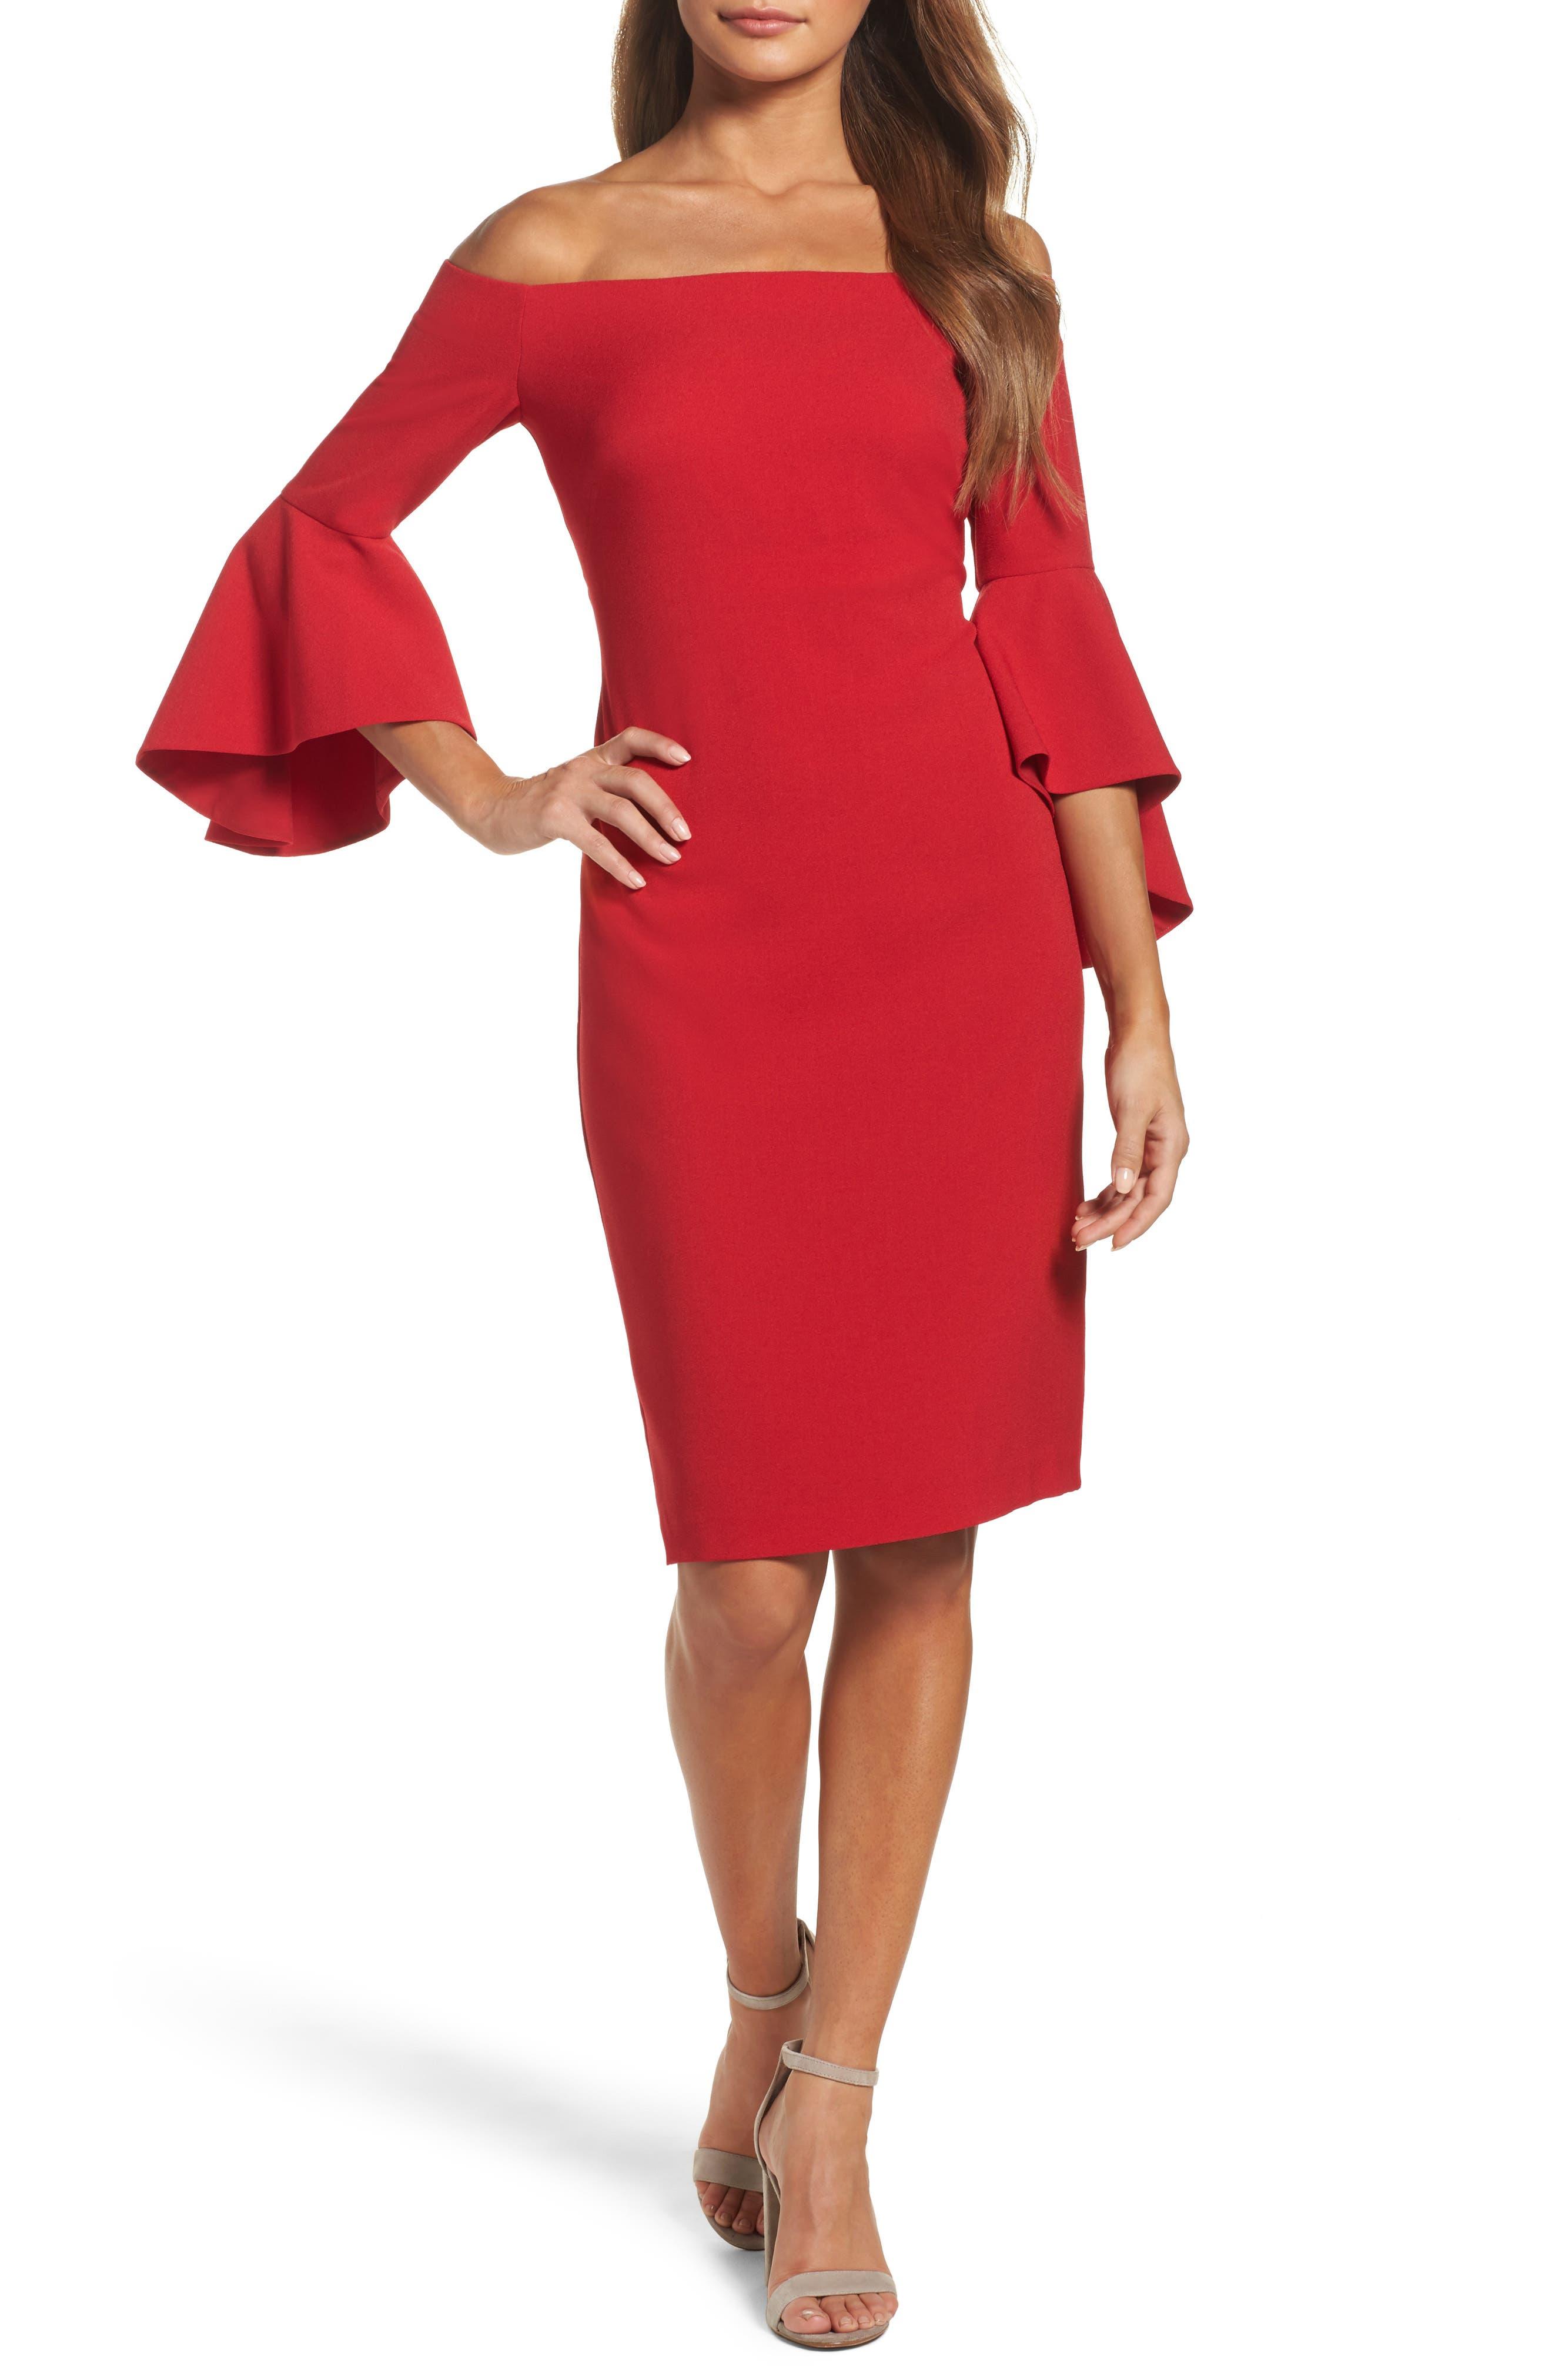 Chelsea28 Off The Shoulder Cocktail Dress, Red